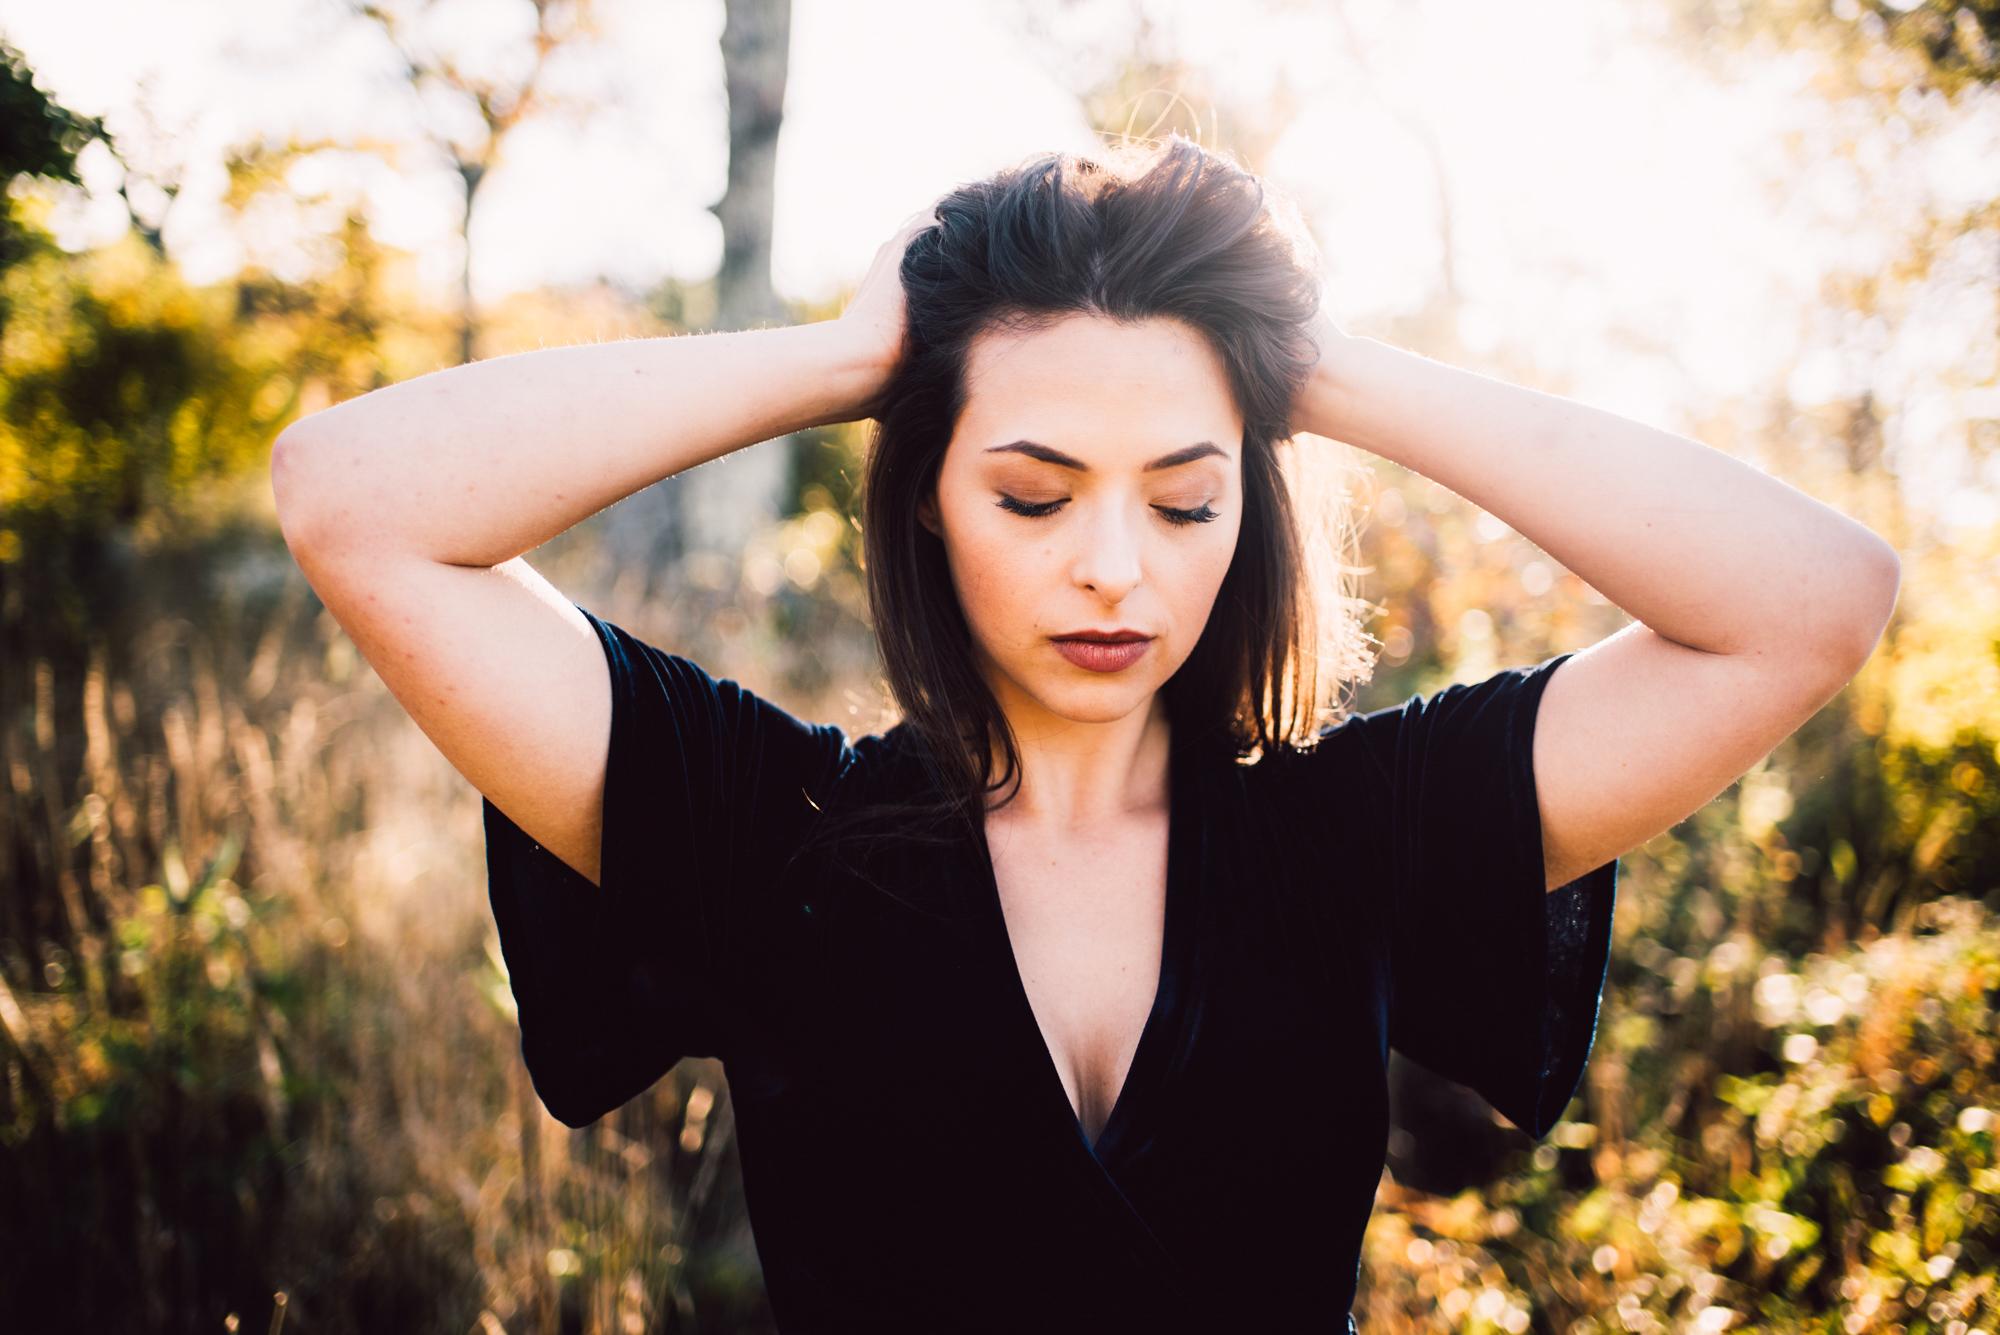 Megan_Shenandoah_National_Park_Windy_Romantic_Portraits_53_1.JPG